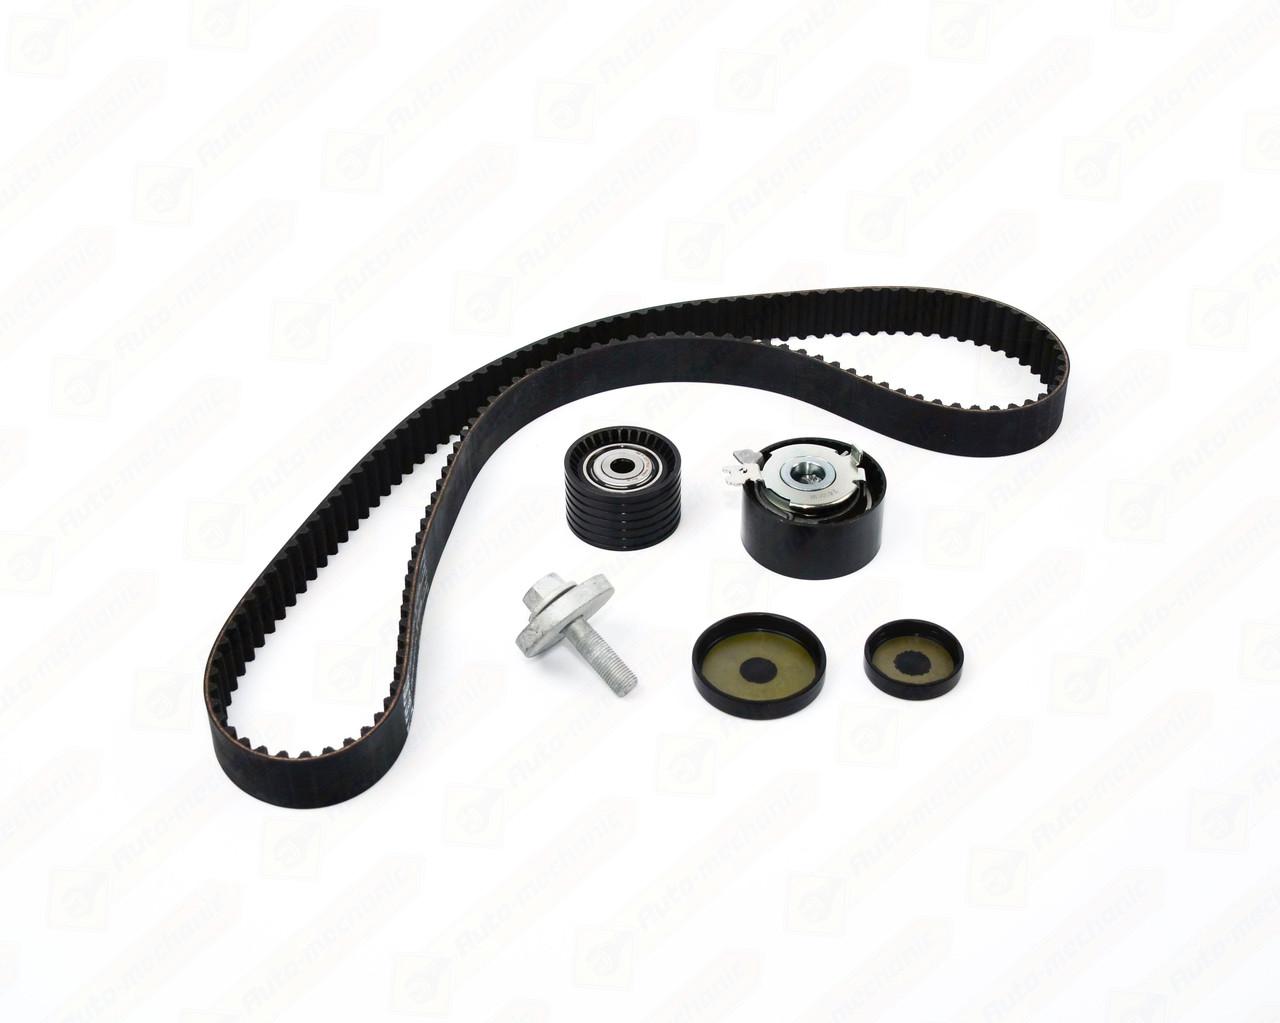 Комплект натягувач + ролик + ремінь ГРМ на Renault Laguna III 1.6 16V — SNR - KD455.57